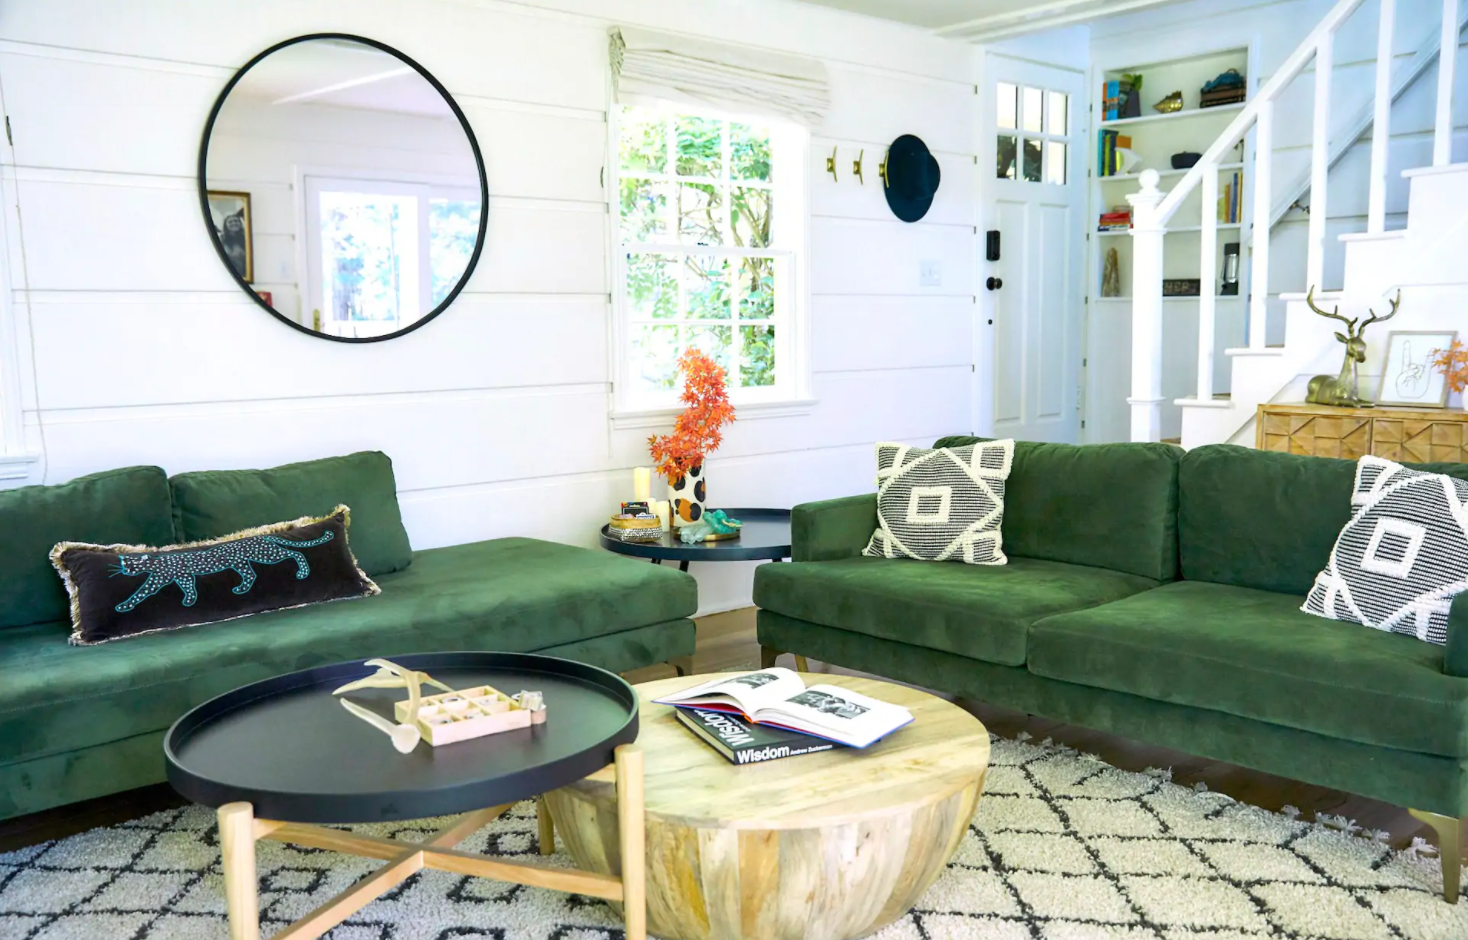 Lake Arrowhead Airbnb